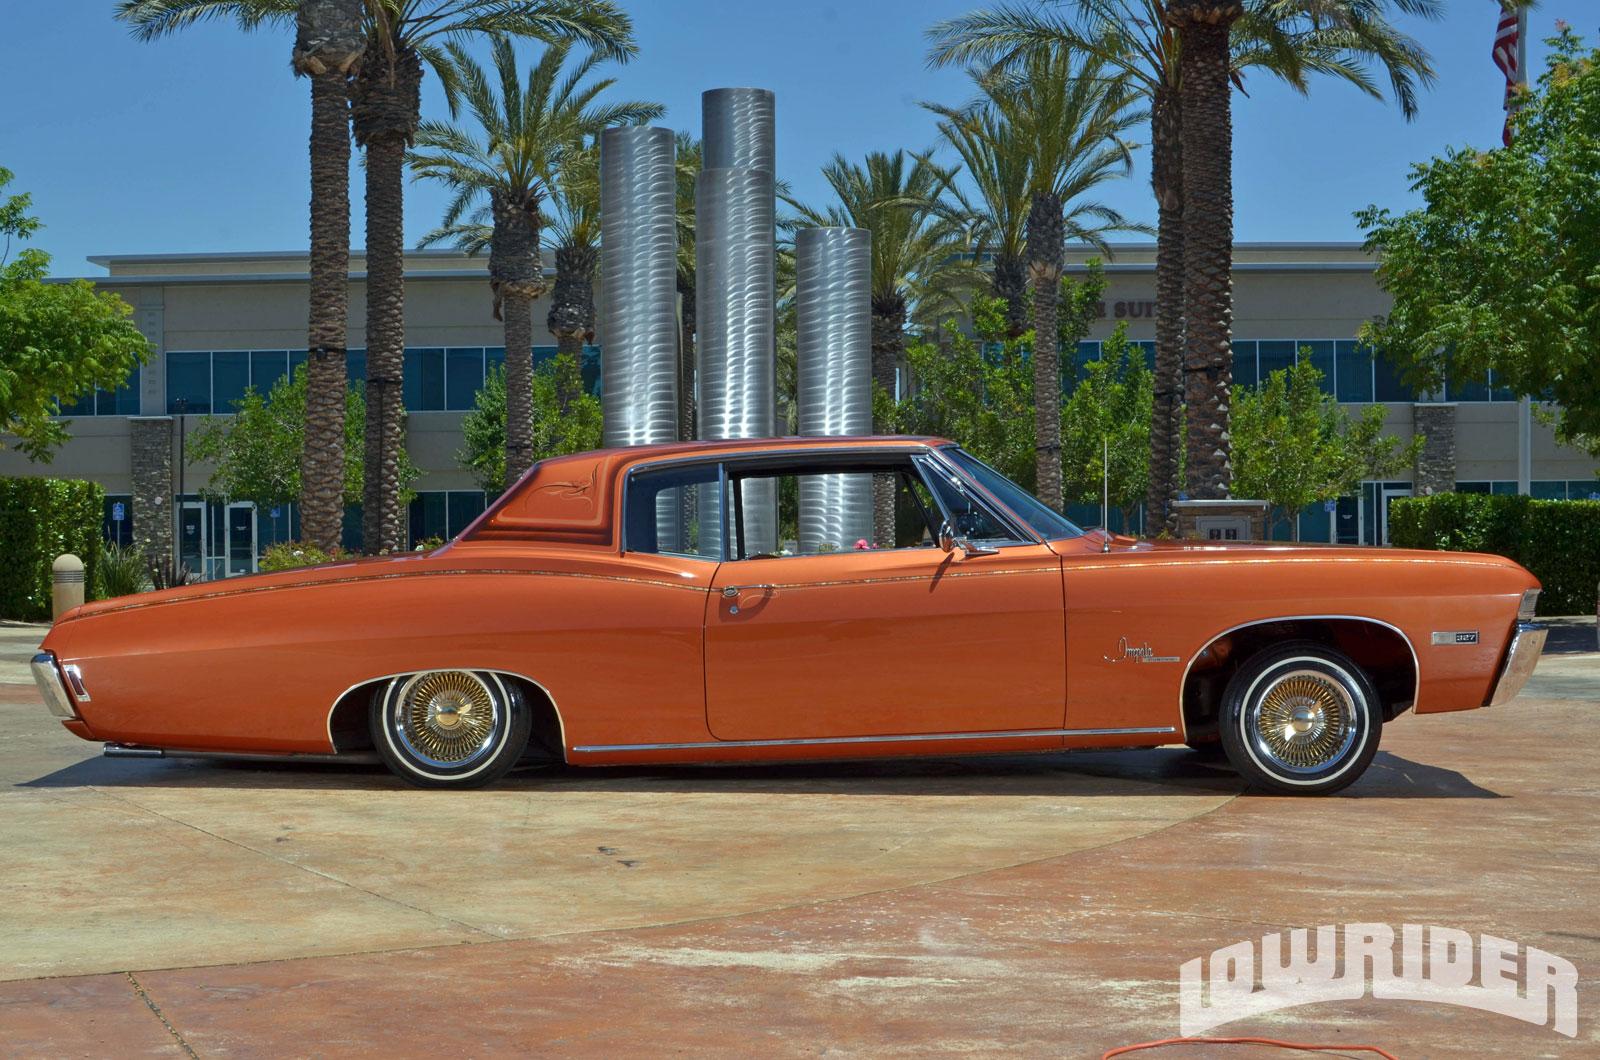 Impala 1968 chevy impala parts : 1968 Chevrolet Impala - Lowrider Magazine